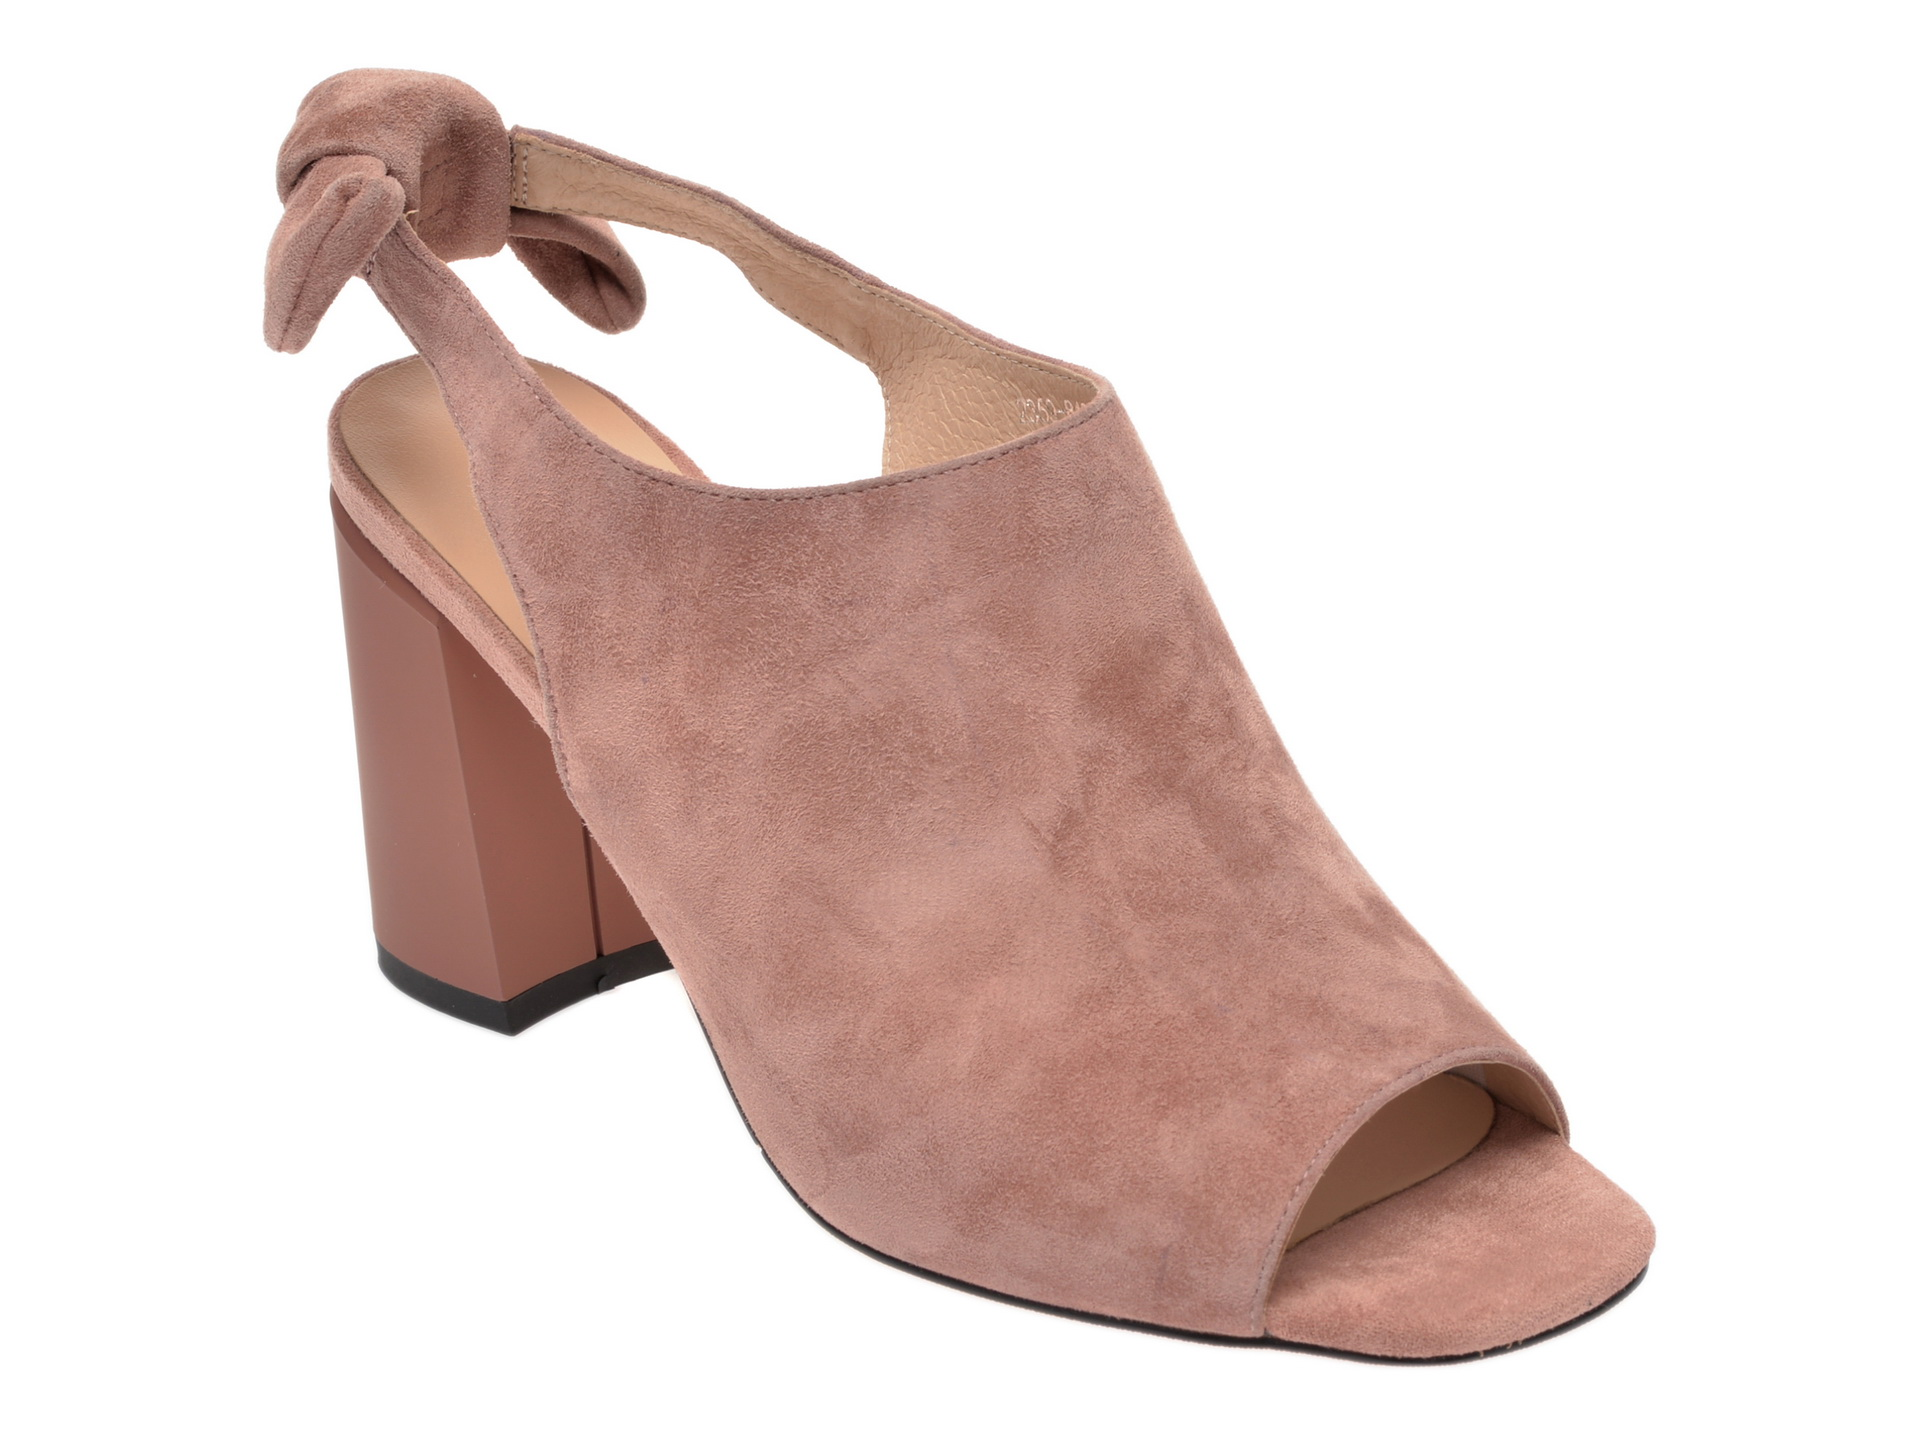 Sandale EPICA roz, 2359843, din piele intoarsa